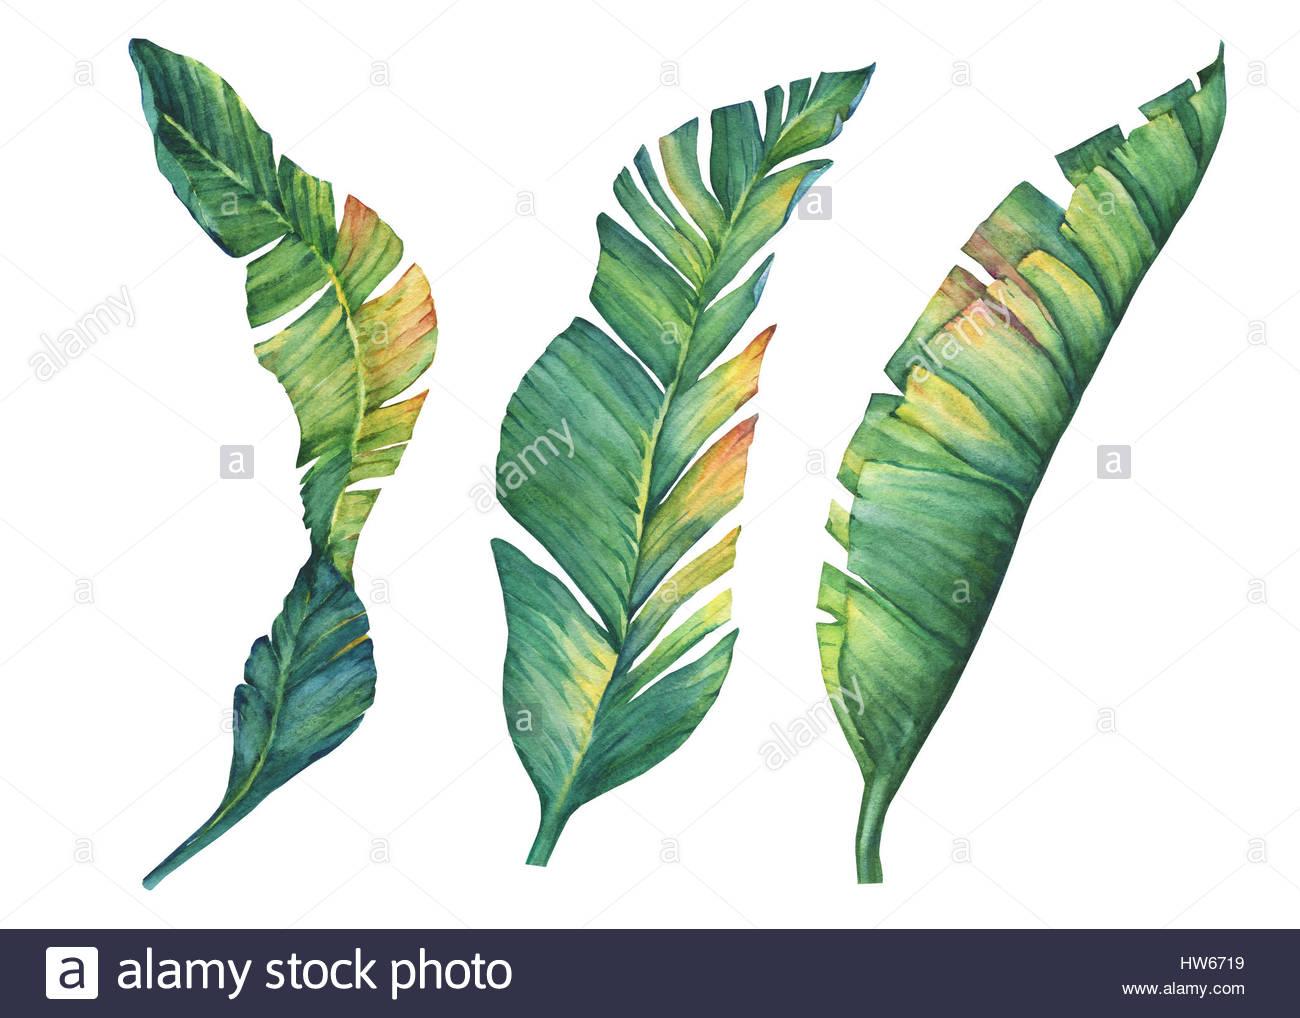 1300x1018 Set Of Exotic Tropical Banana Leaves. Hand Drawn Watercolor